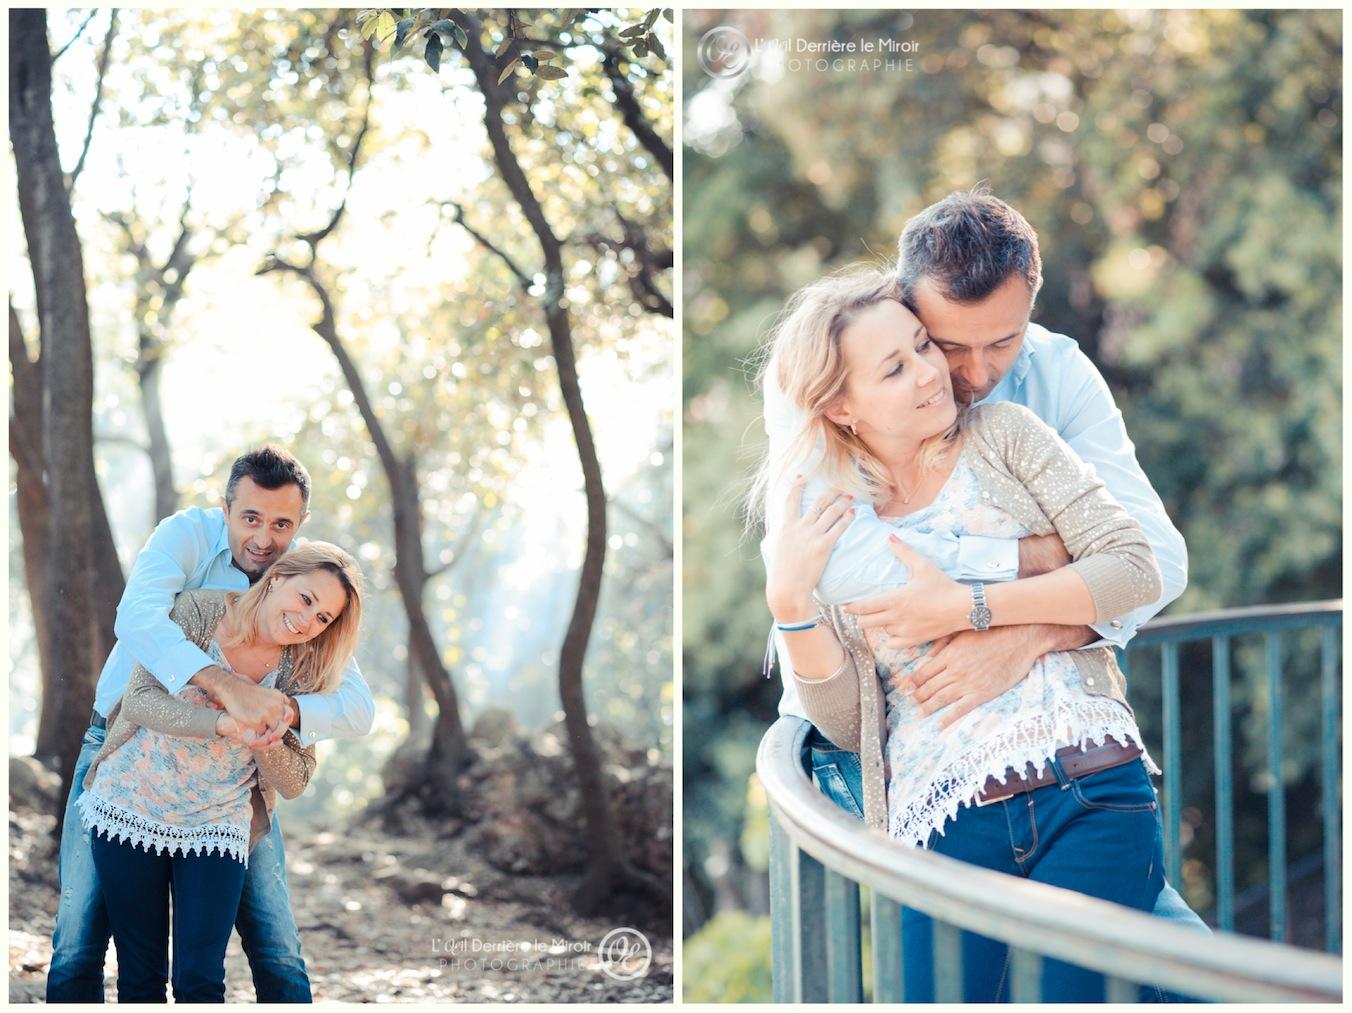 Photographe-Couple-Grasse-dj05